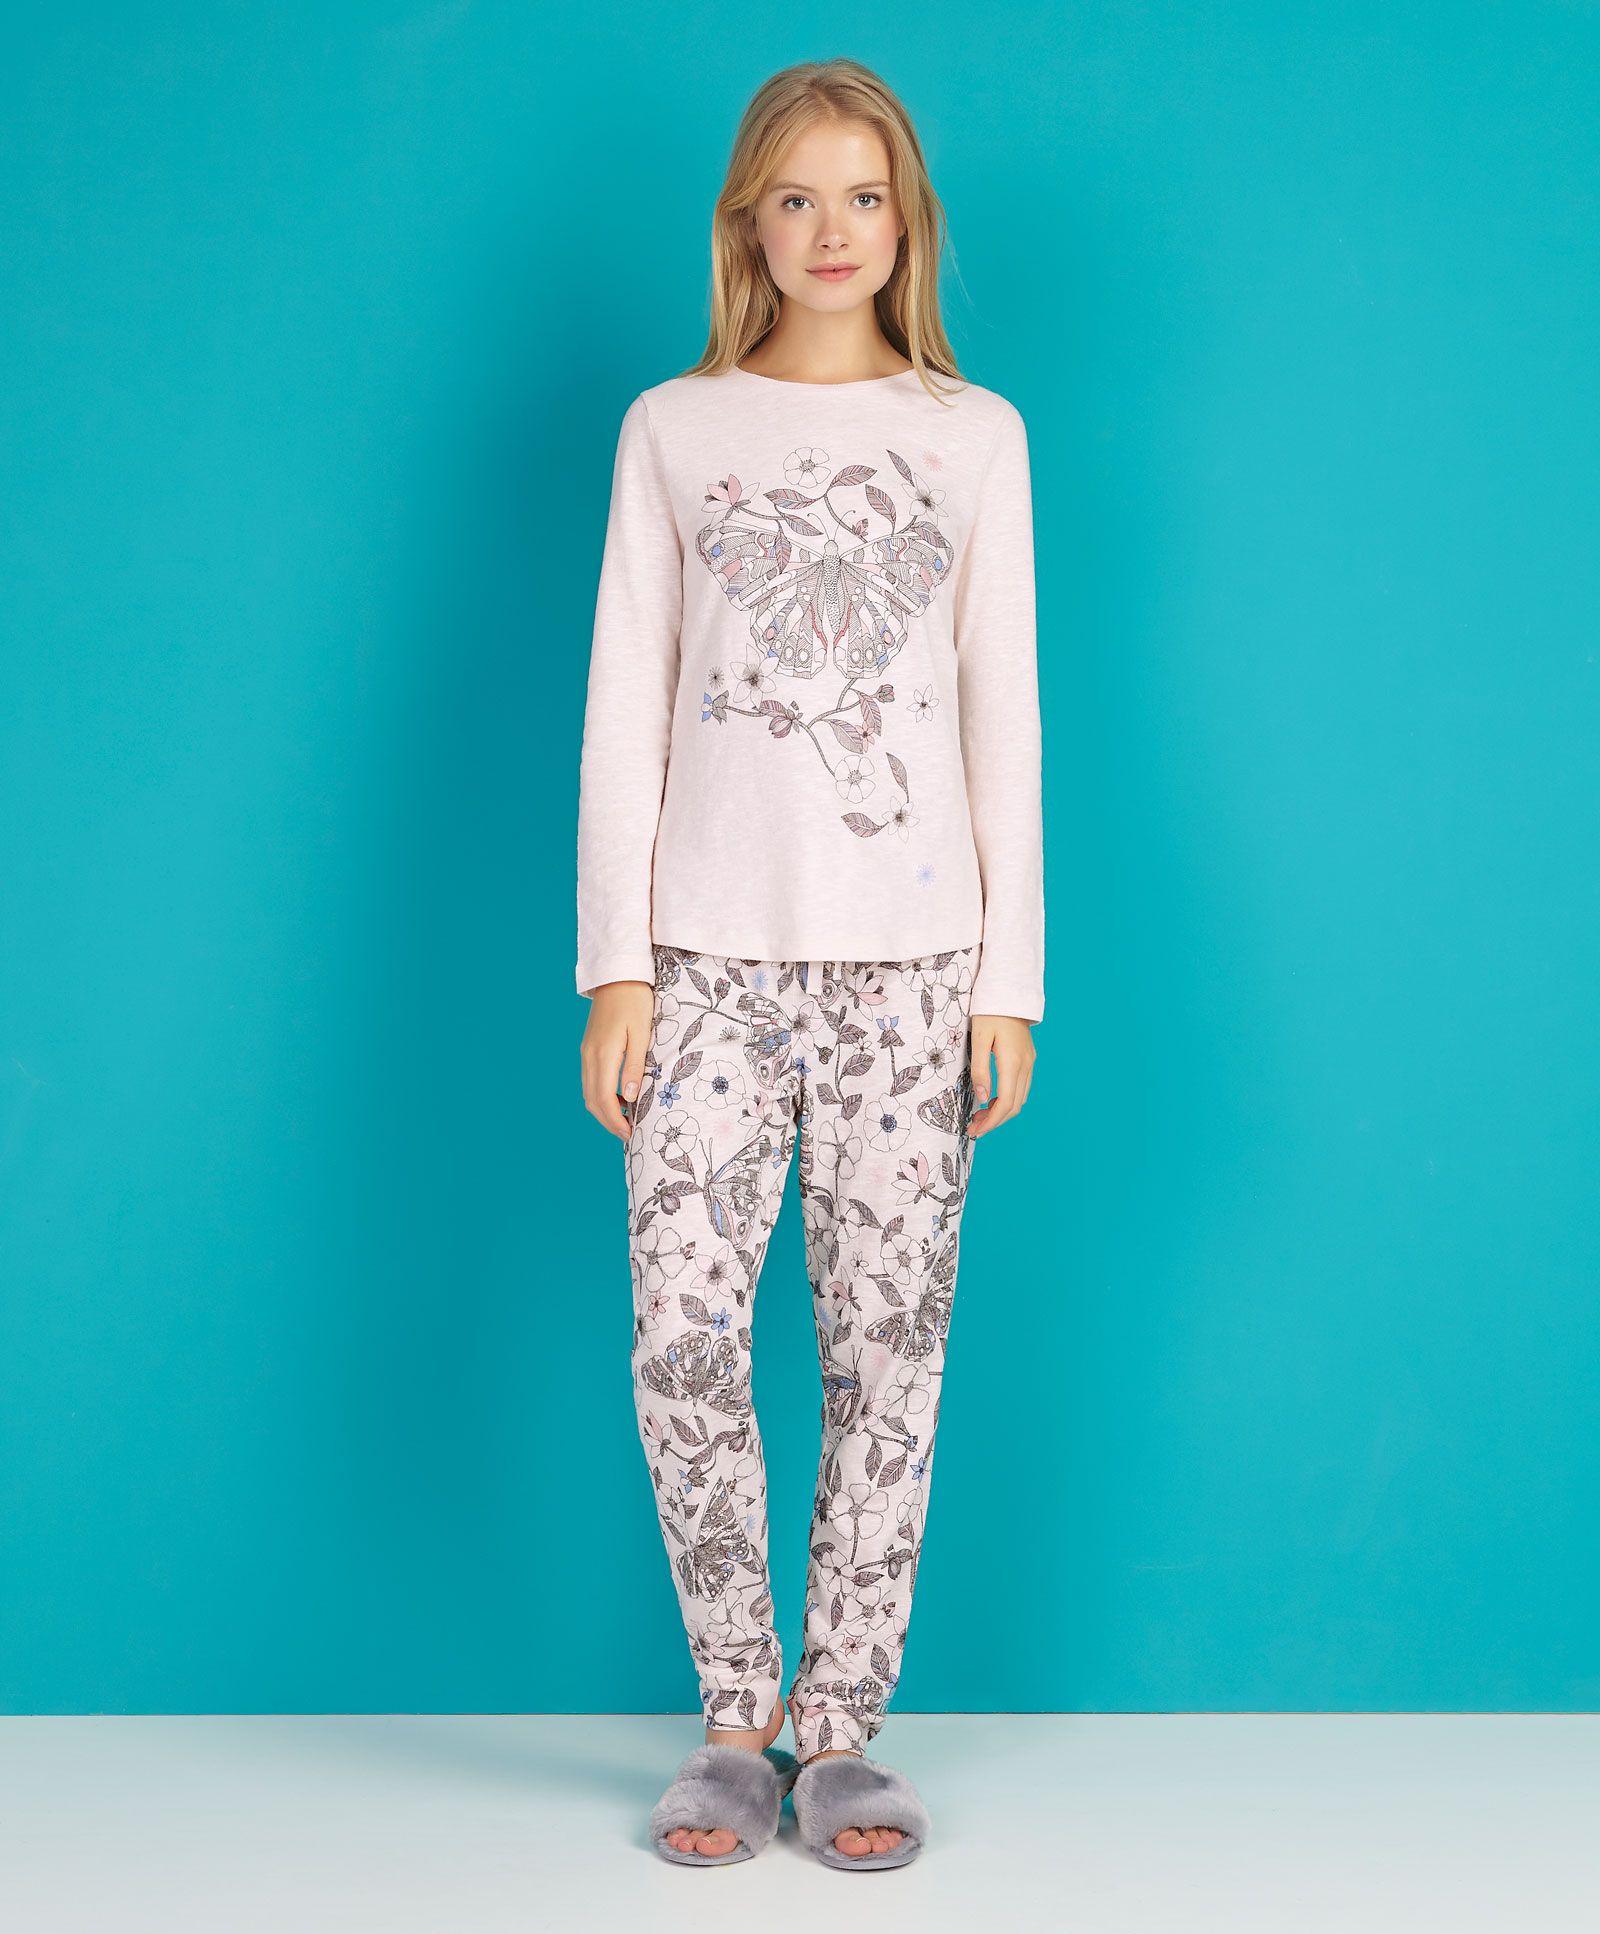 Camiseta posicional mariposa - OYSHO